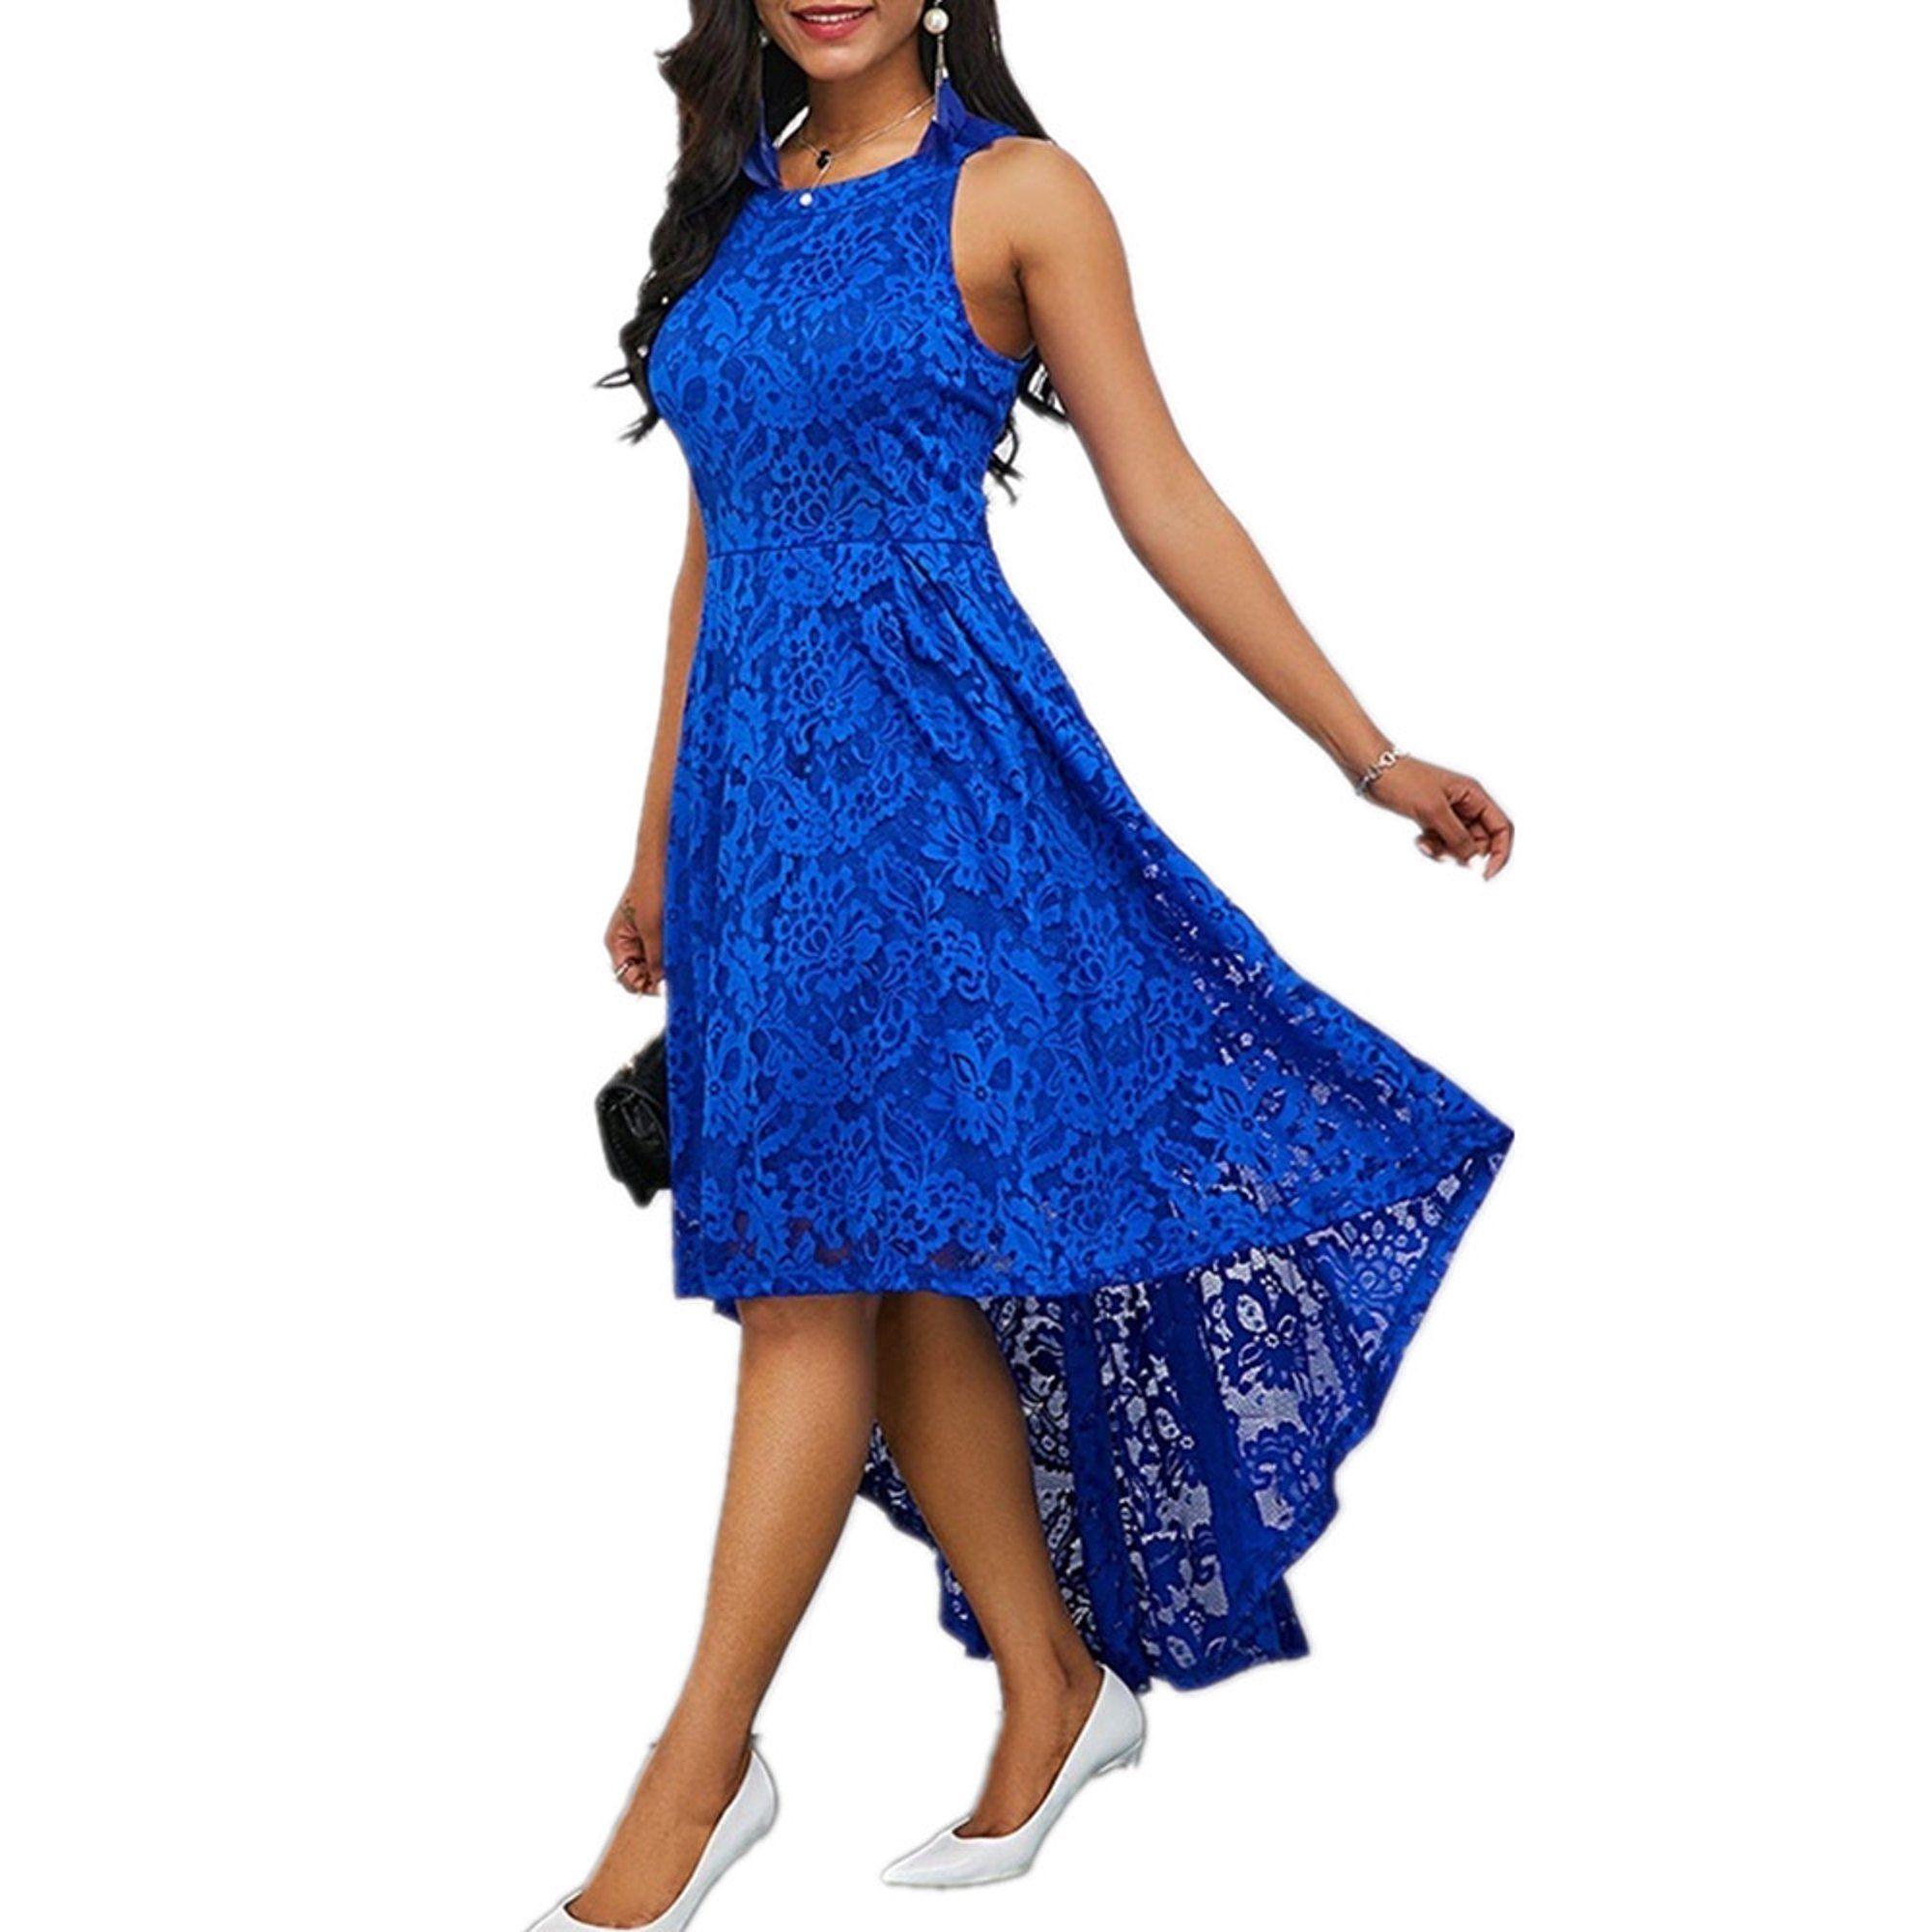 Sysea Sleeveless Lace Patchwork Women Irregular Dress Walmart Com Midi Cocktail Dress Dresses Types Of Dresses [ 2000 x 2000 Pixel ]